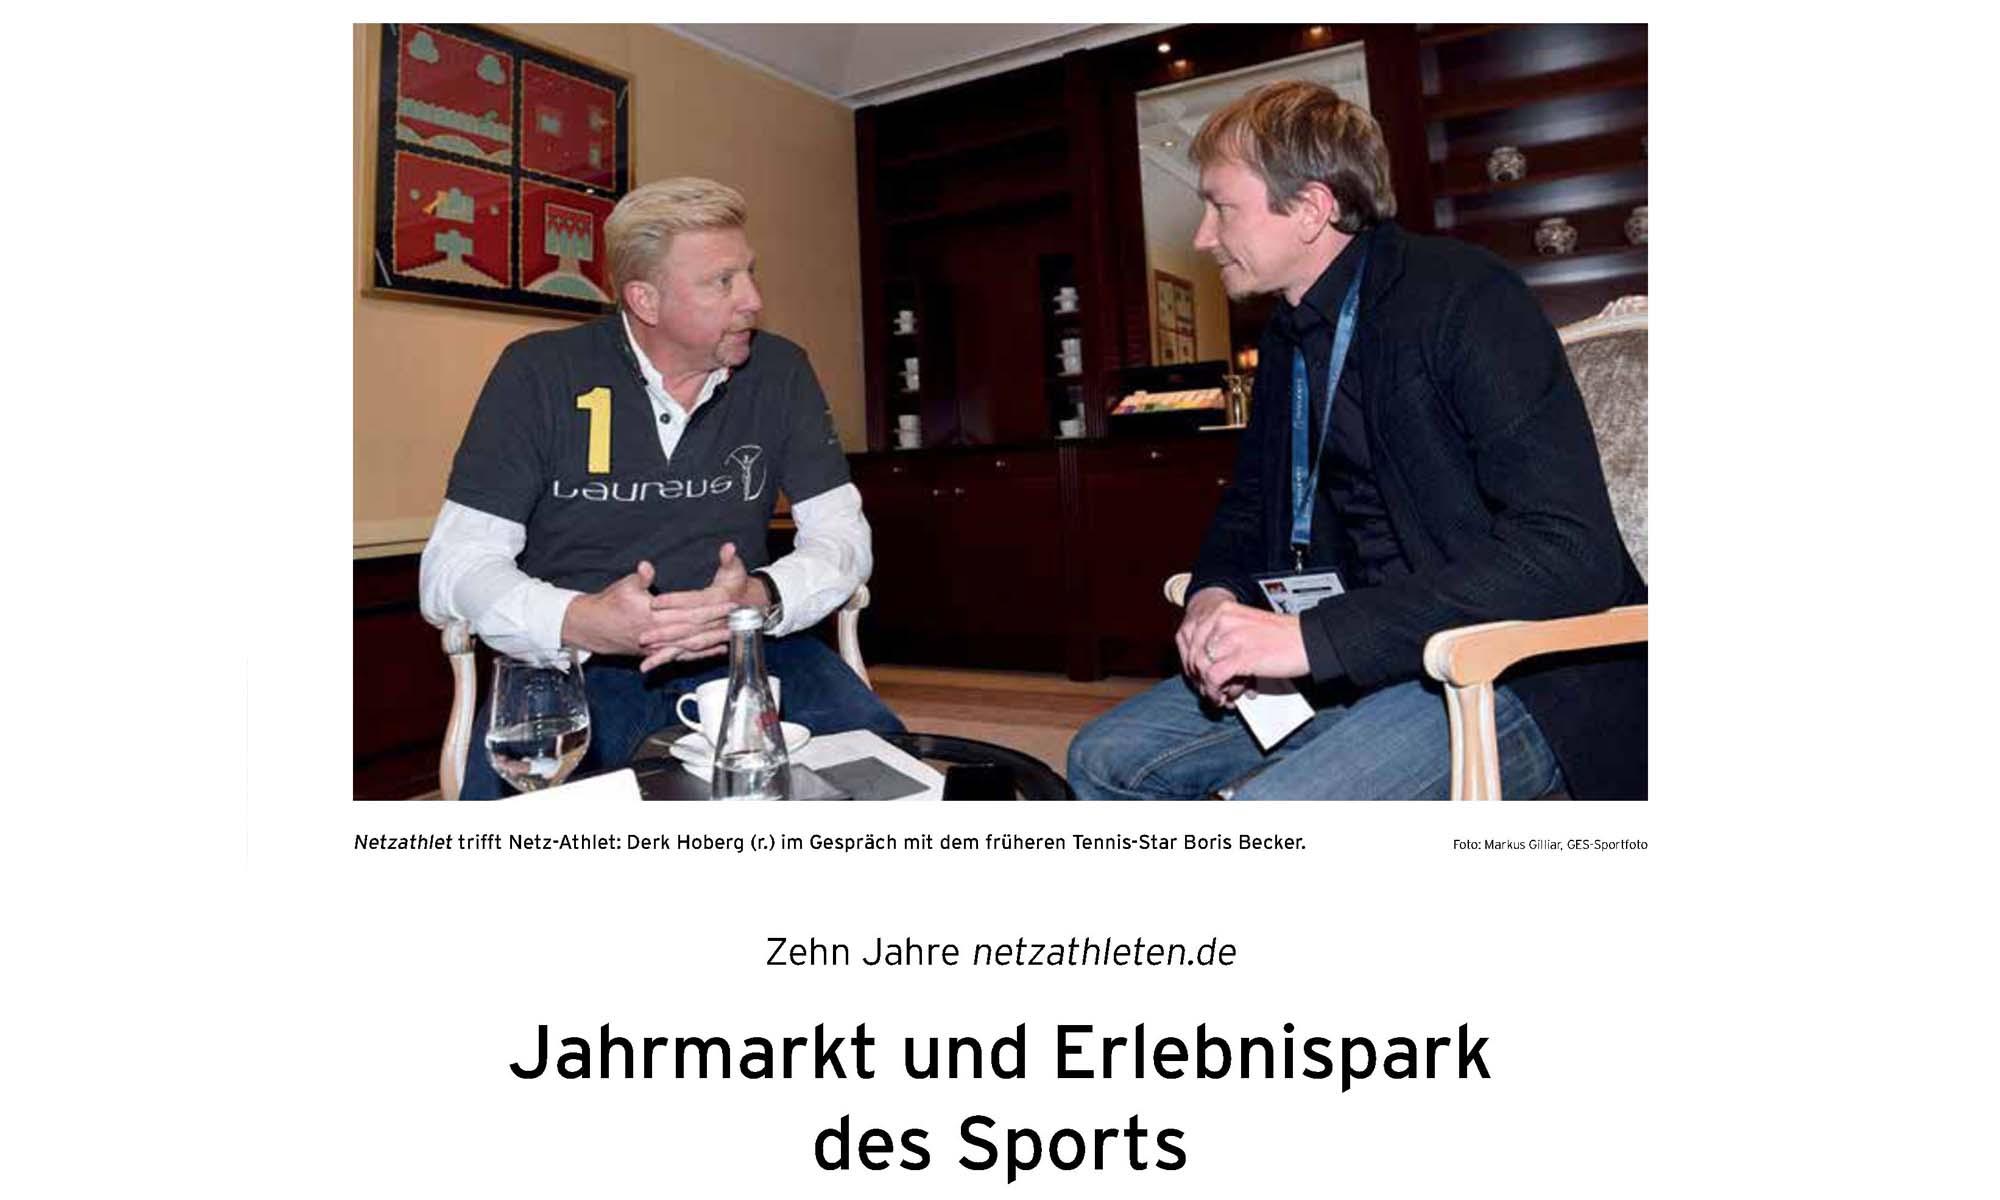 Derk Hoberg, Boris Becker